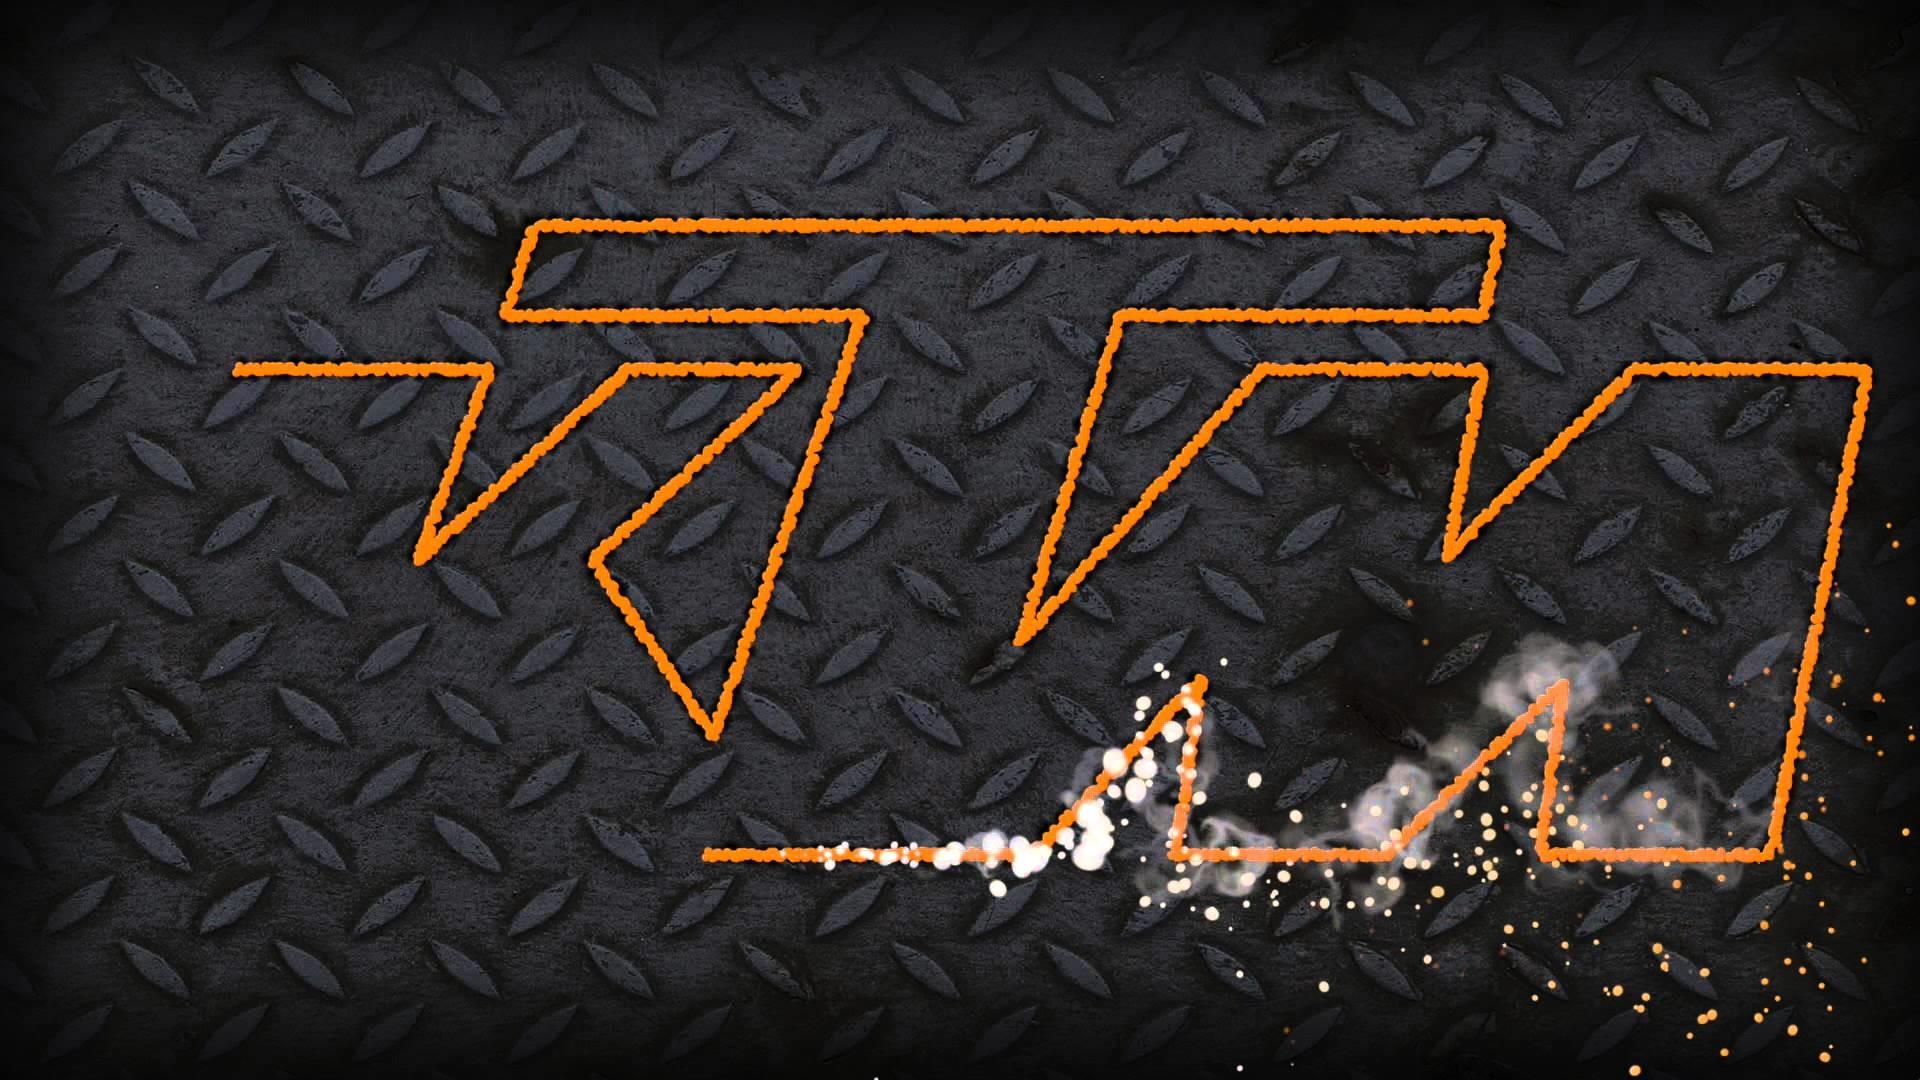 ktm logo wallpaper hd  70  images